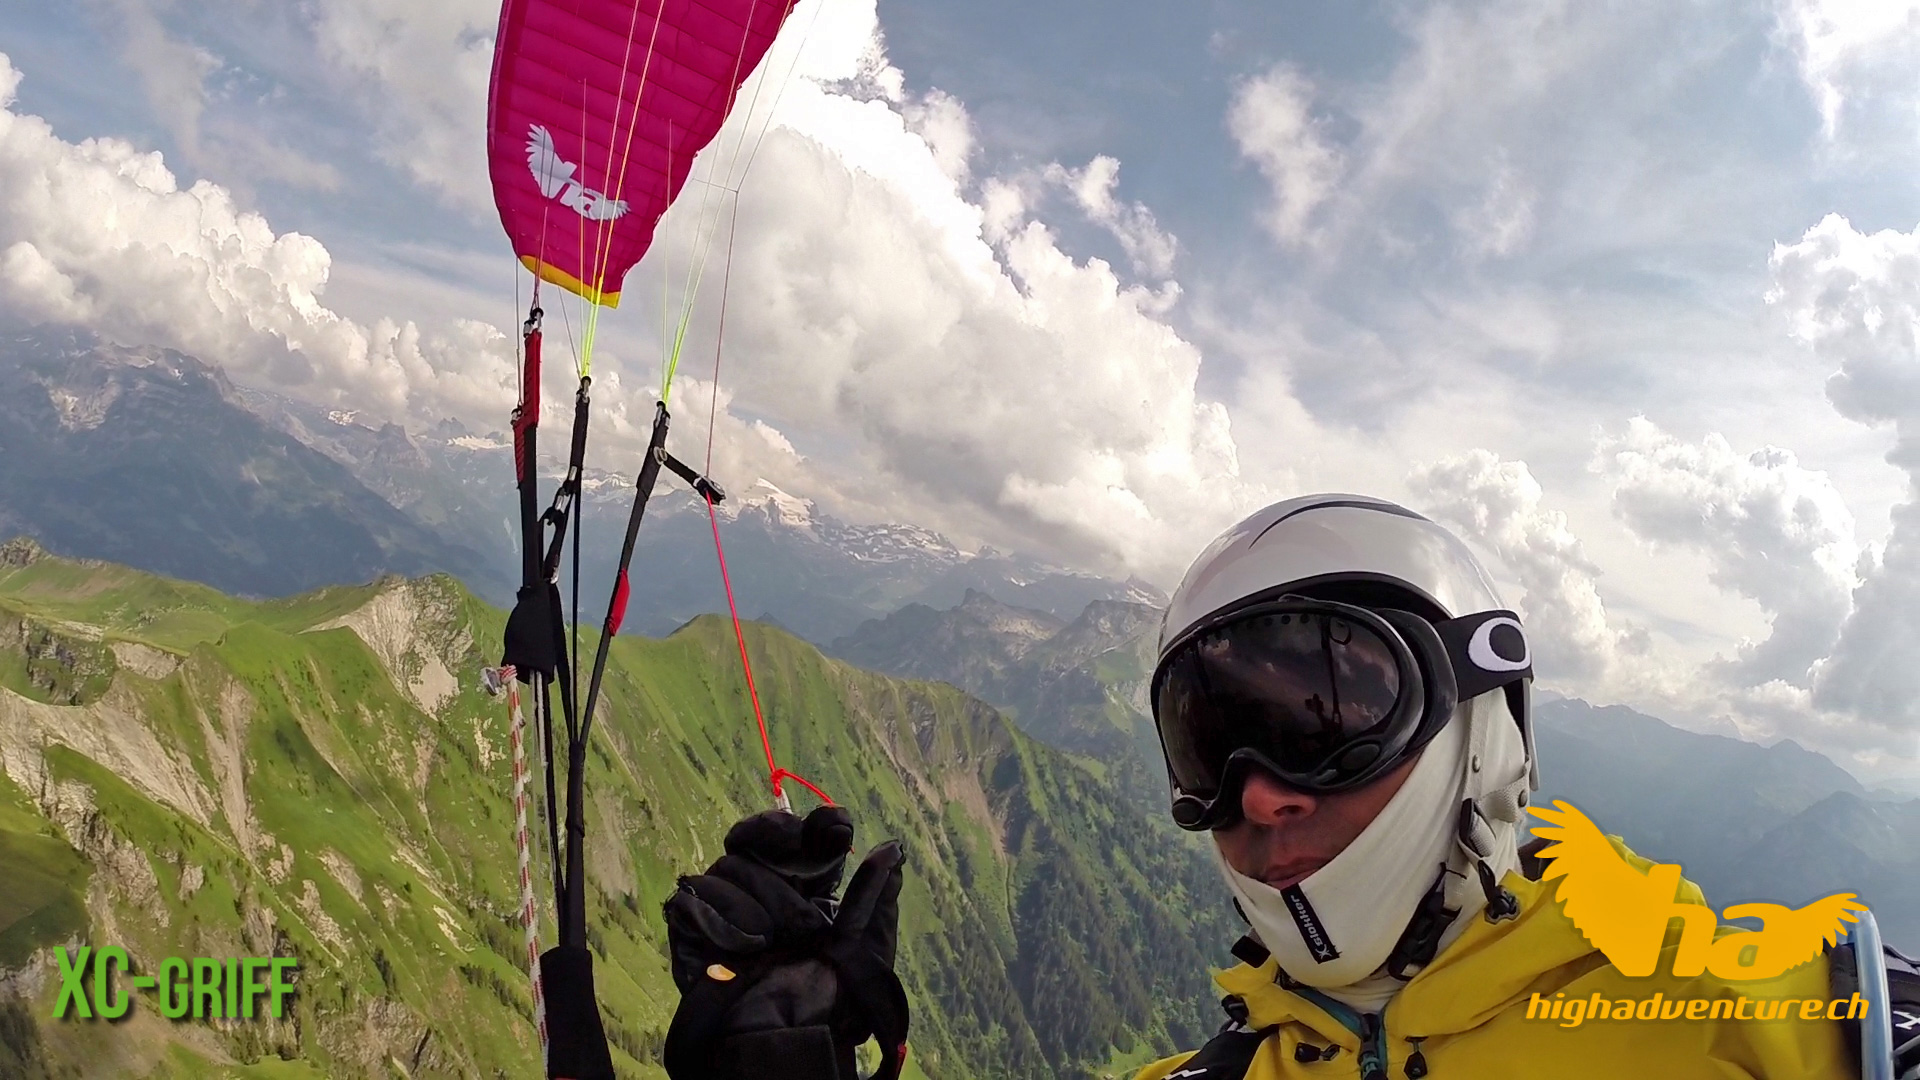 High Adventure - XC-Griff - Paragliding Handles